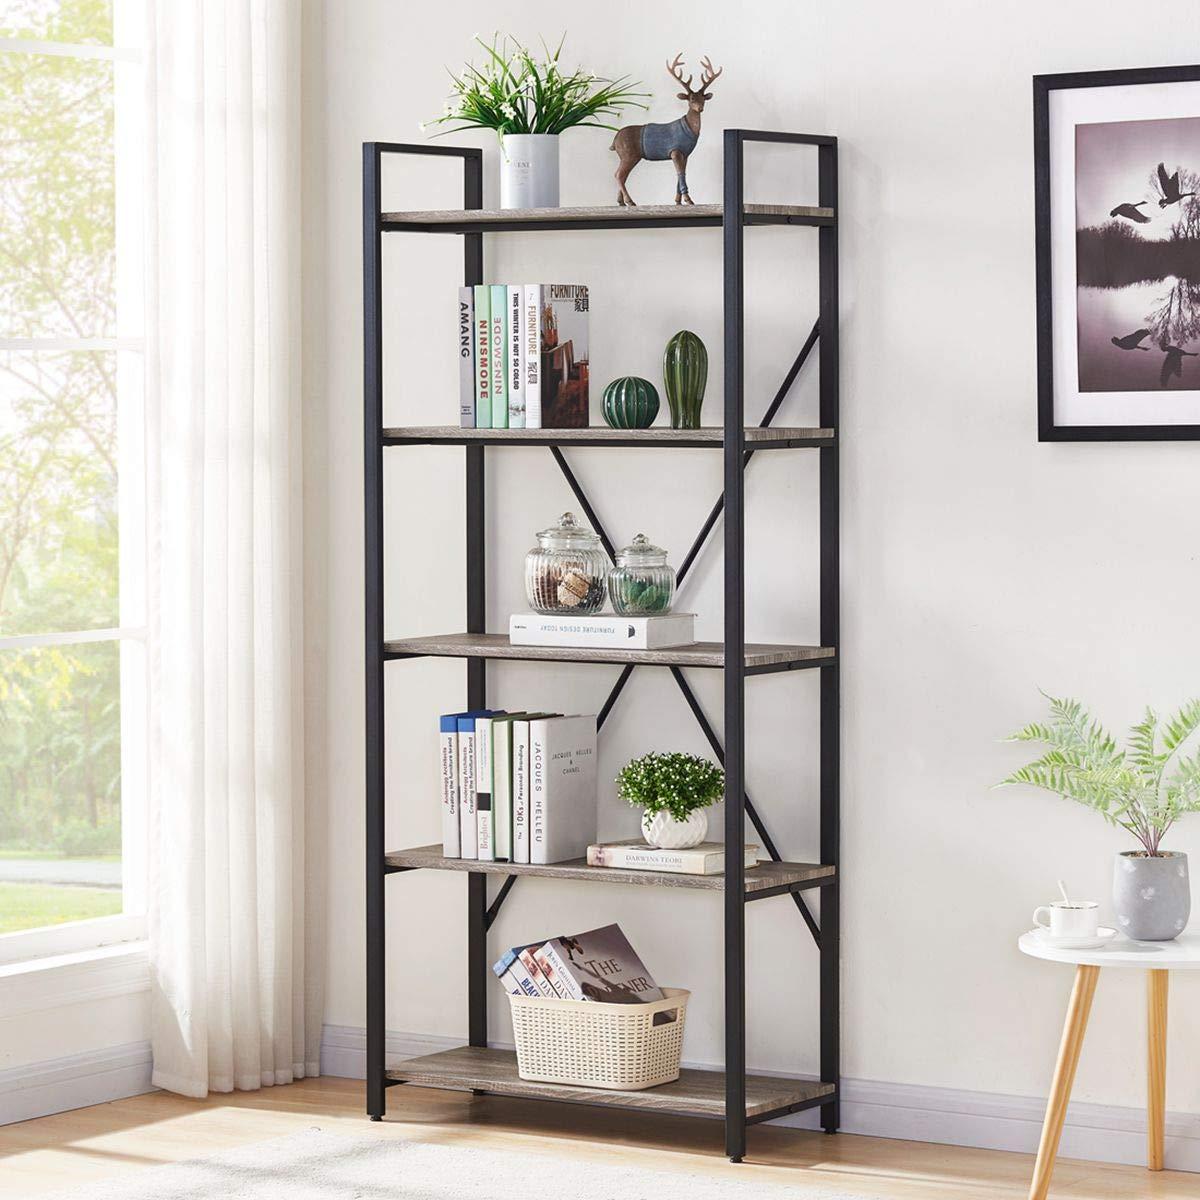 BON AUGURE Bookshelf 5 Tier Etagere Bookcase, Wood and Metal Shelving Unit, Industrial Bookshelves and Bookcases (Dark Gray Oak) by BON AUGURE